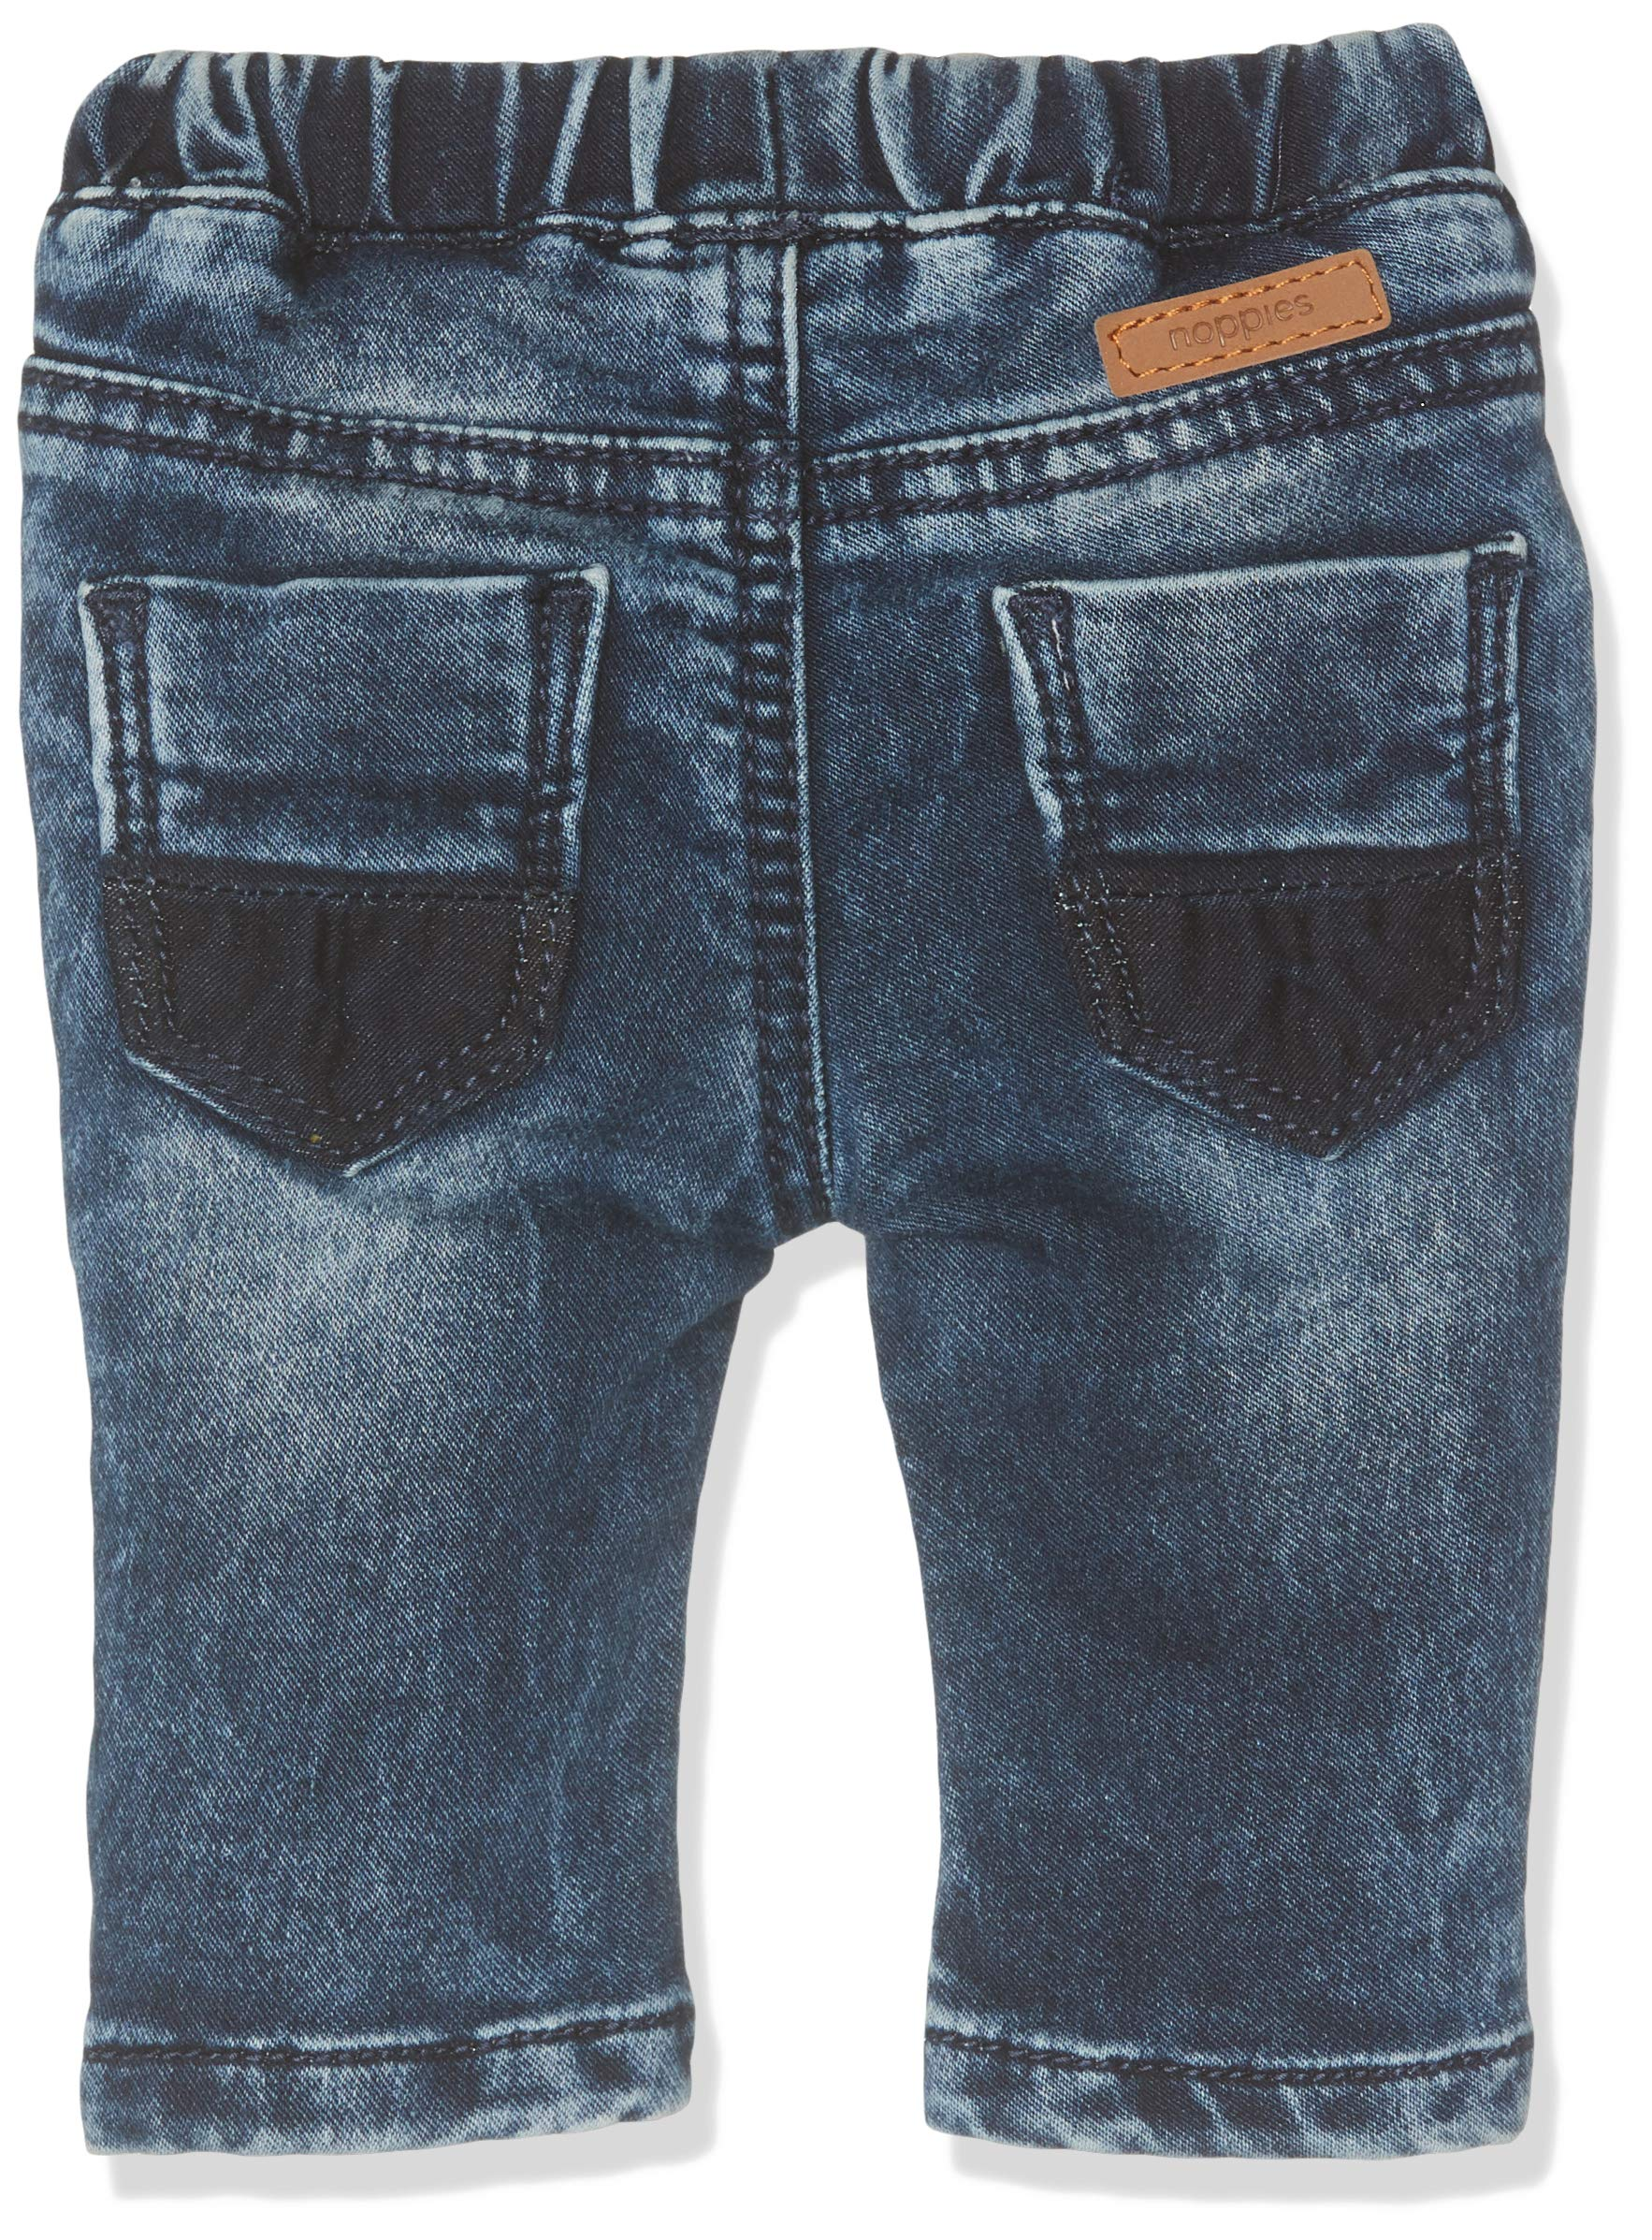 Noppies B Demin Pants Slim Suffern Jeans para Bebés 2